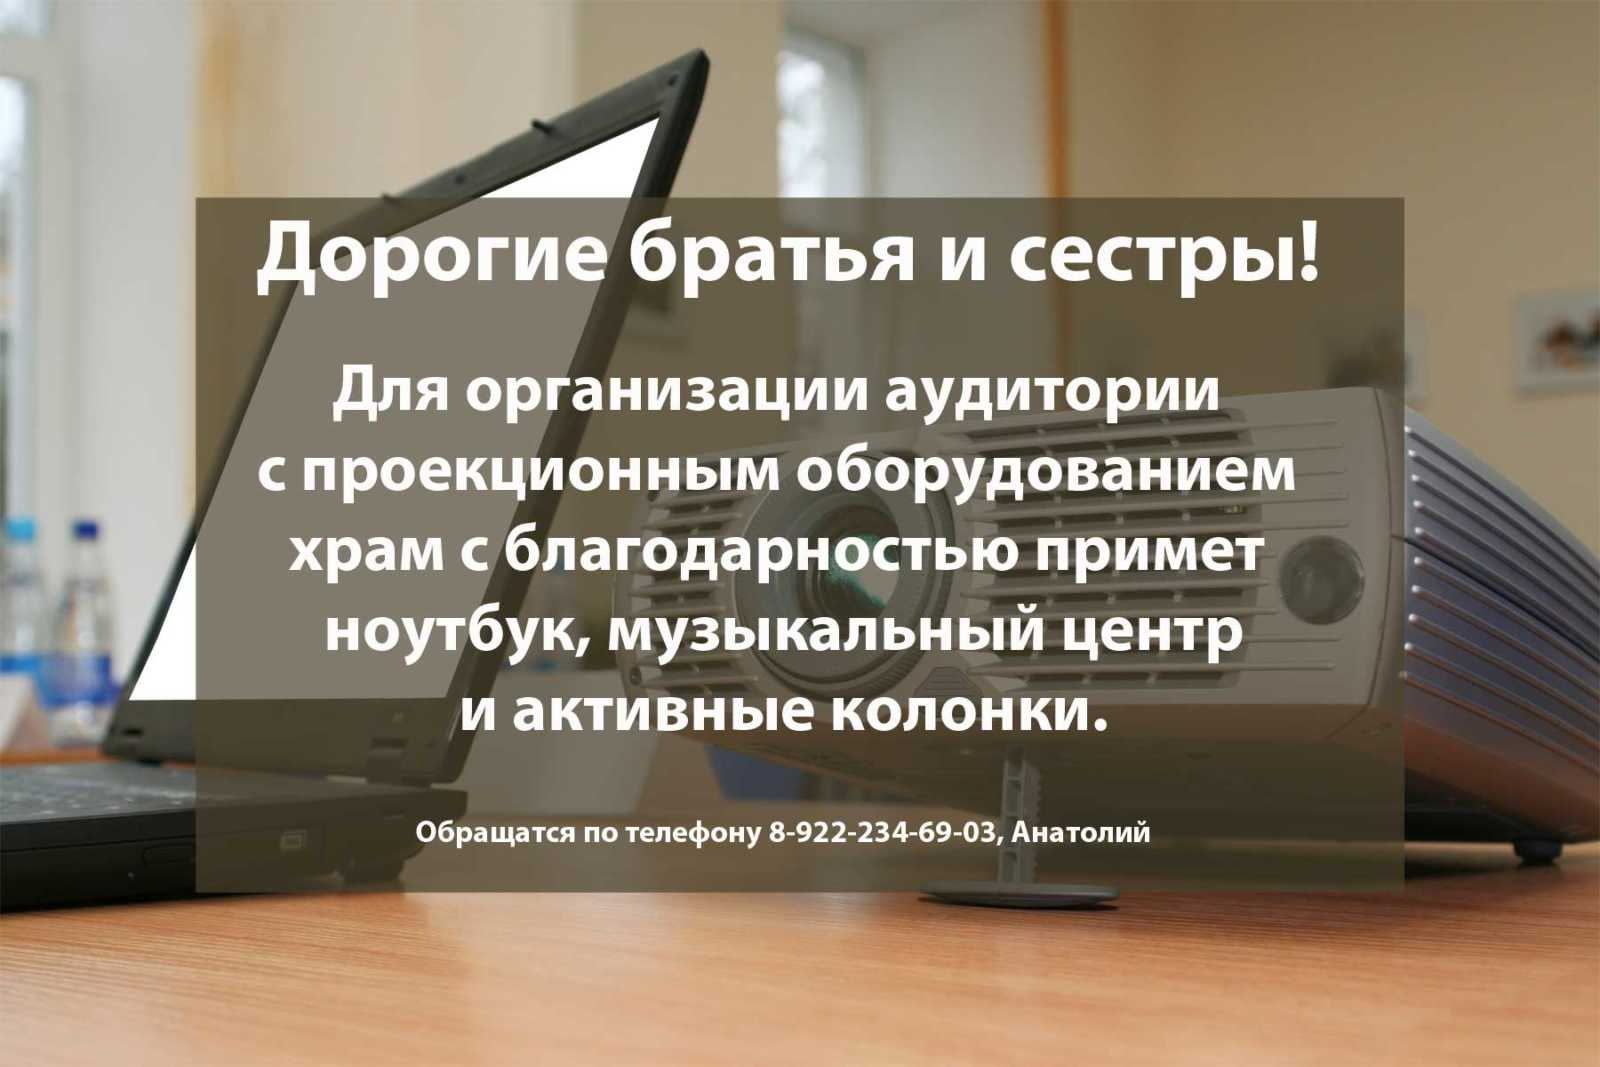 Объявление ноутбук, муз центр, колонки